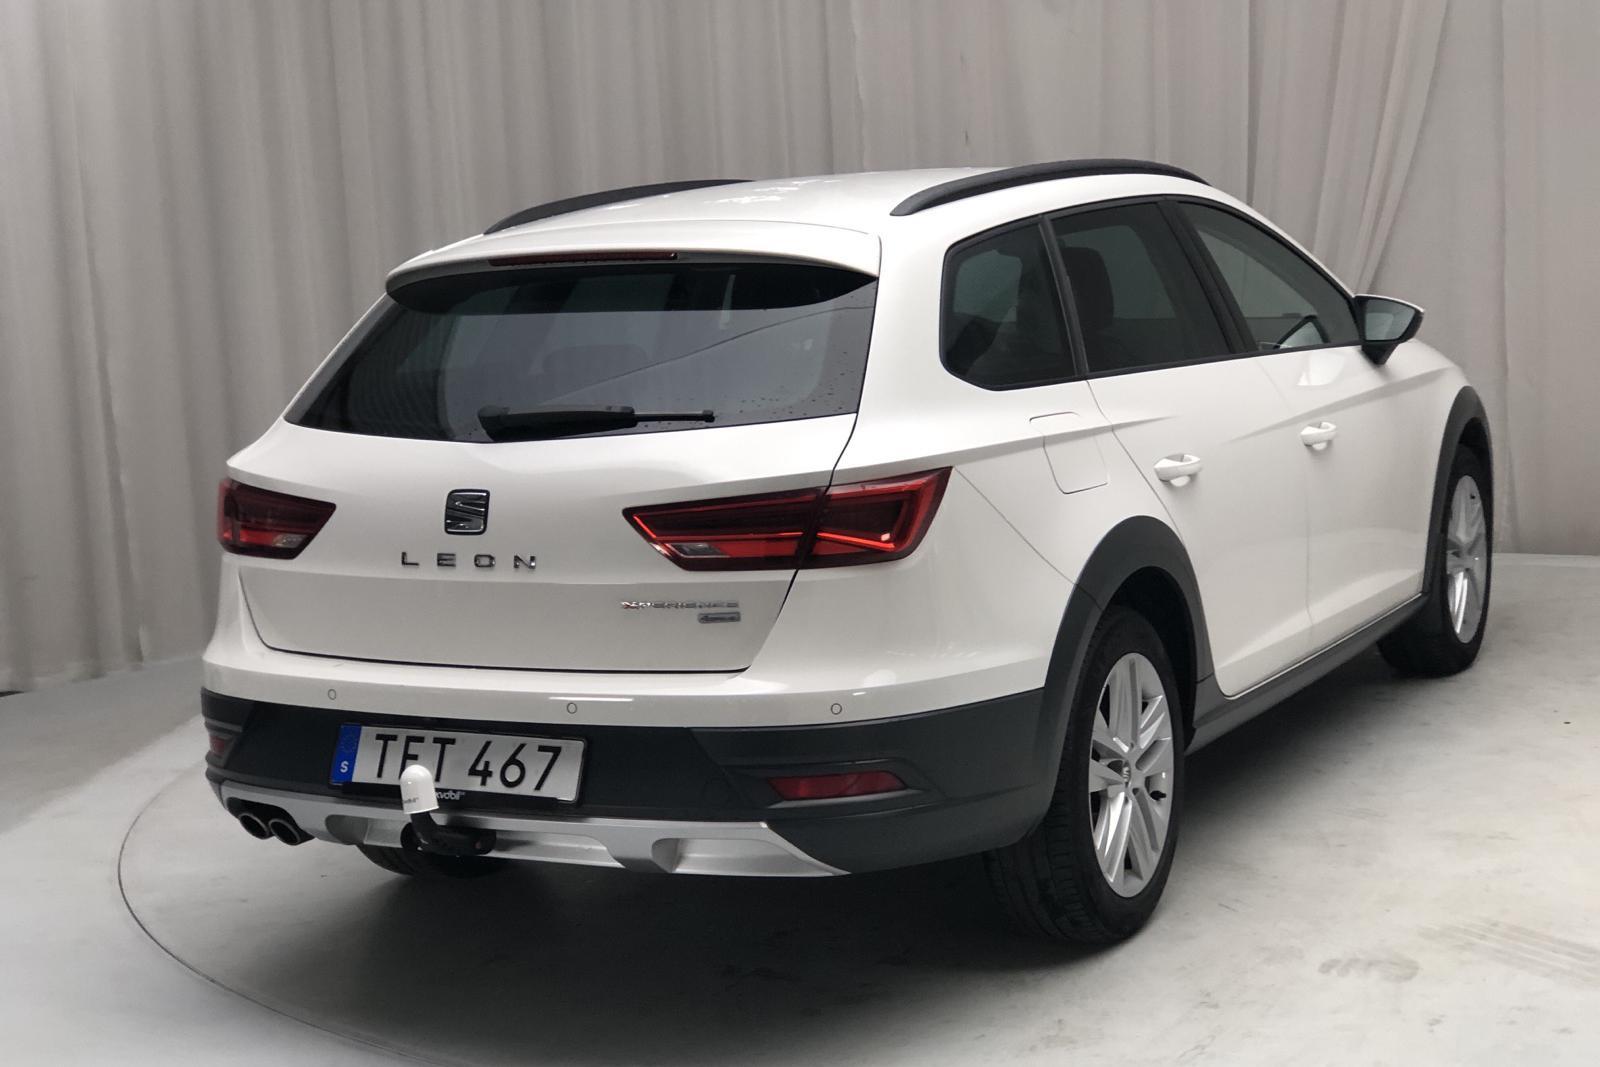 Seat Leon 2.0 TDI ST X-PERIENCE 4Drive (150hk) - 0 km - Manual - white - 2018